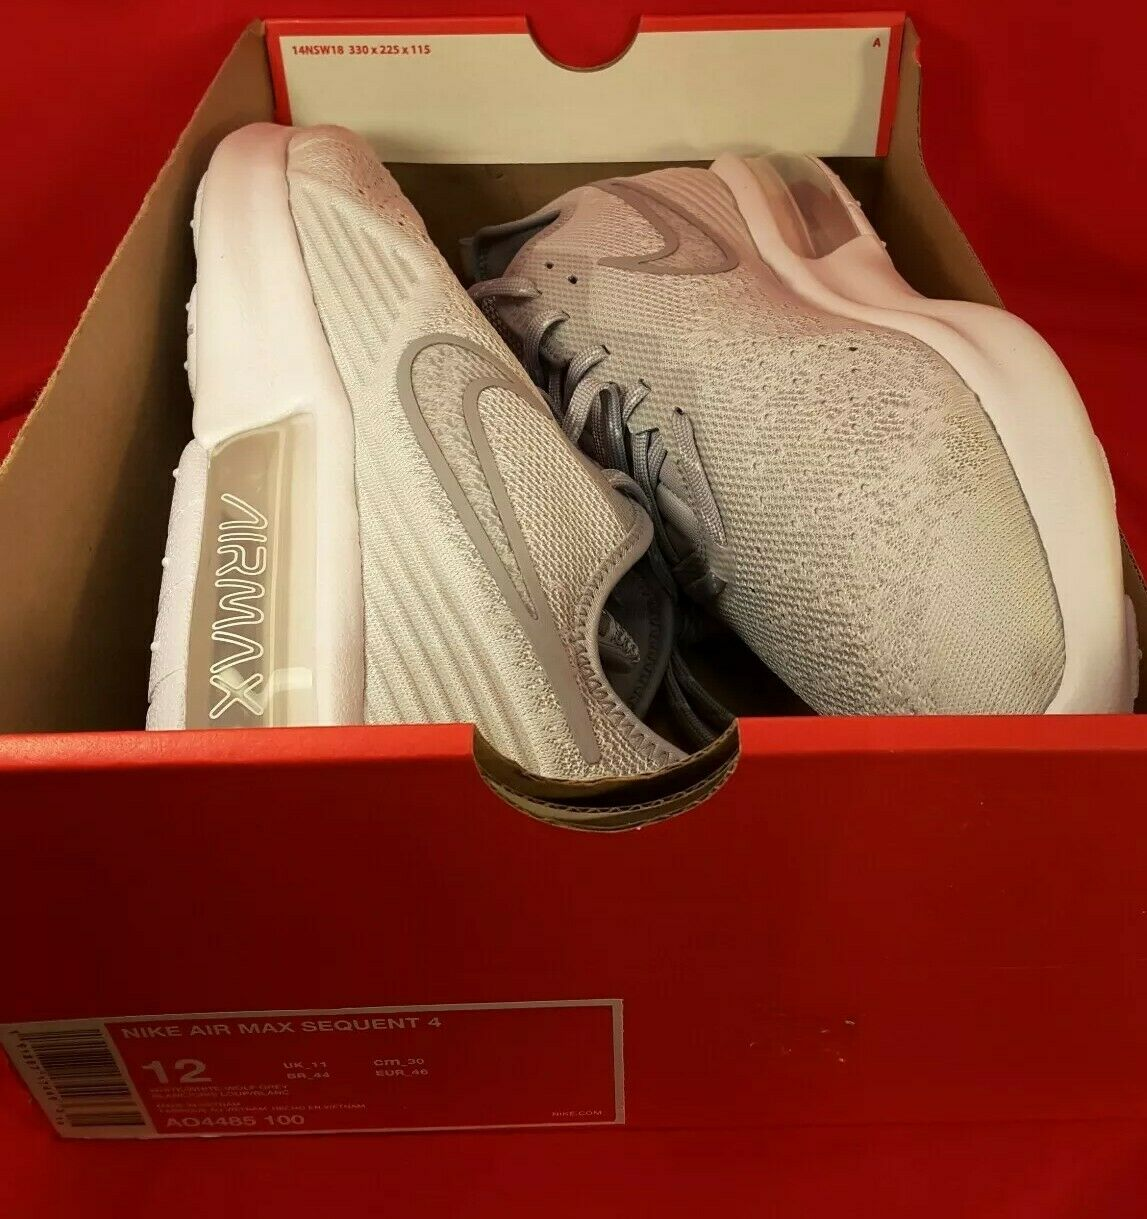 Nike Air Max Sequent 4, vit  Wolf grå, AO4485 -100, ny in Box, US män 12